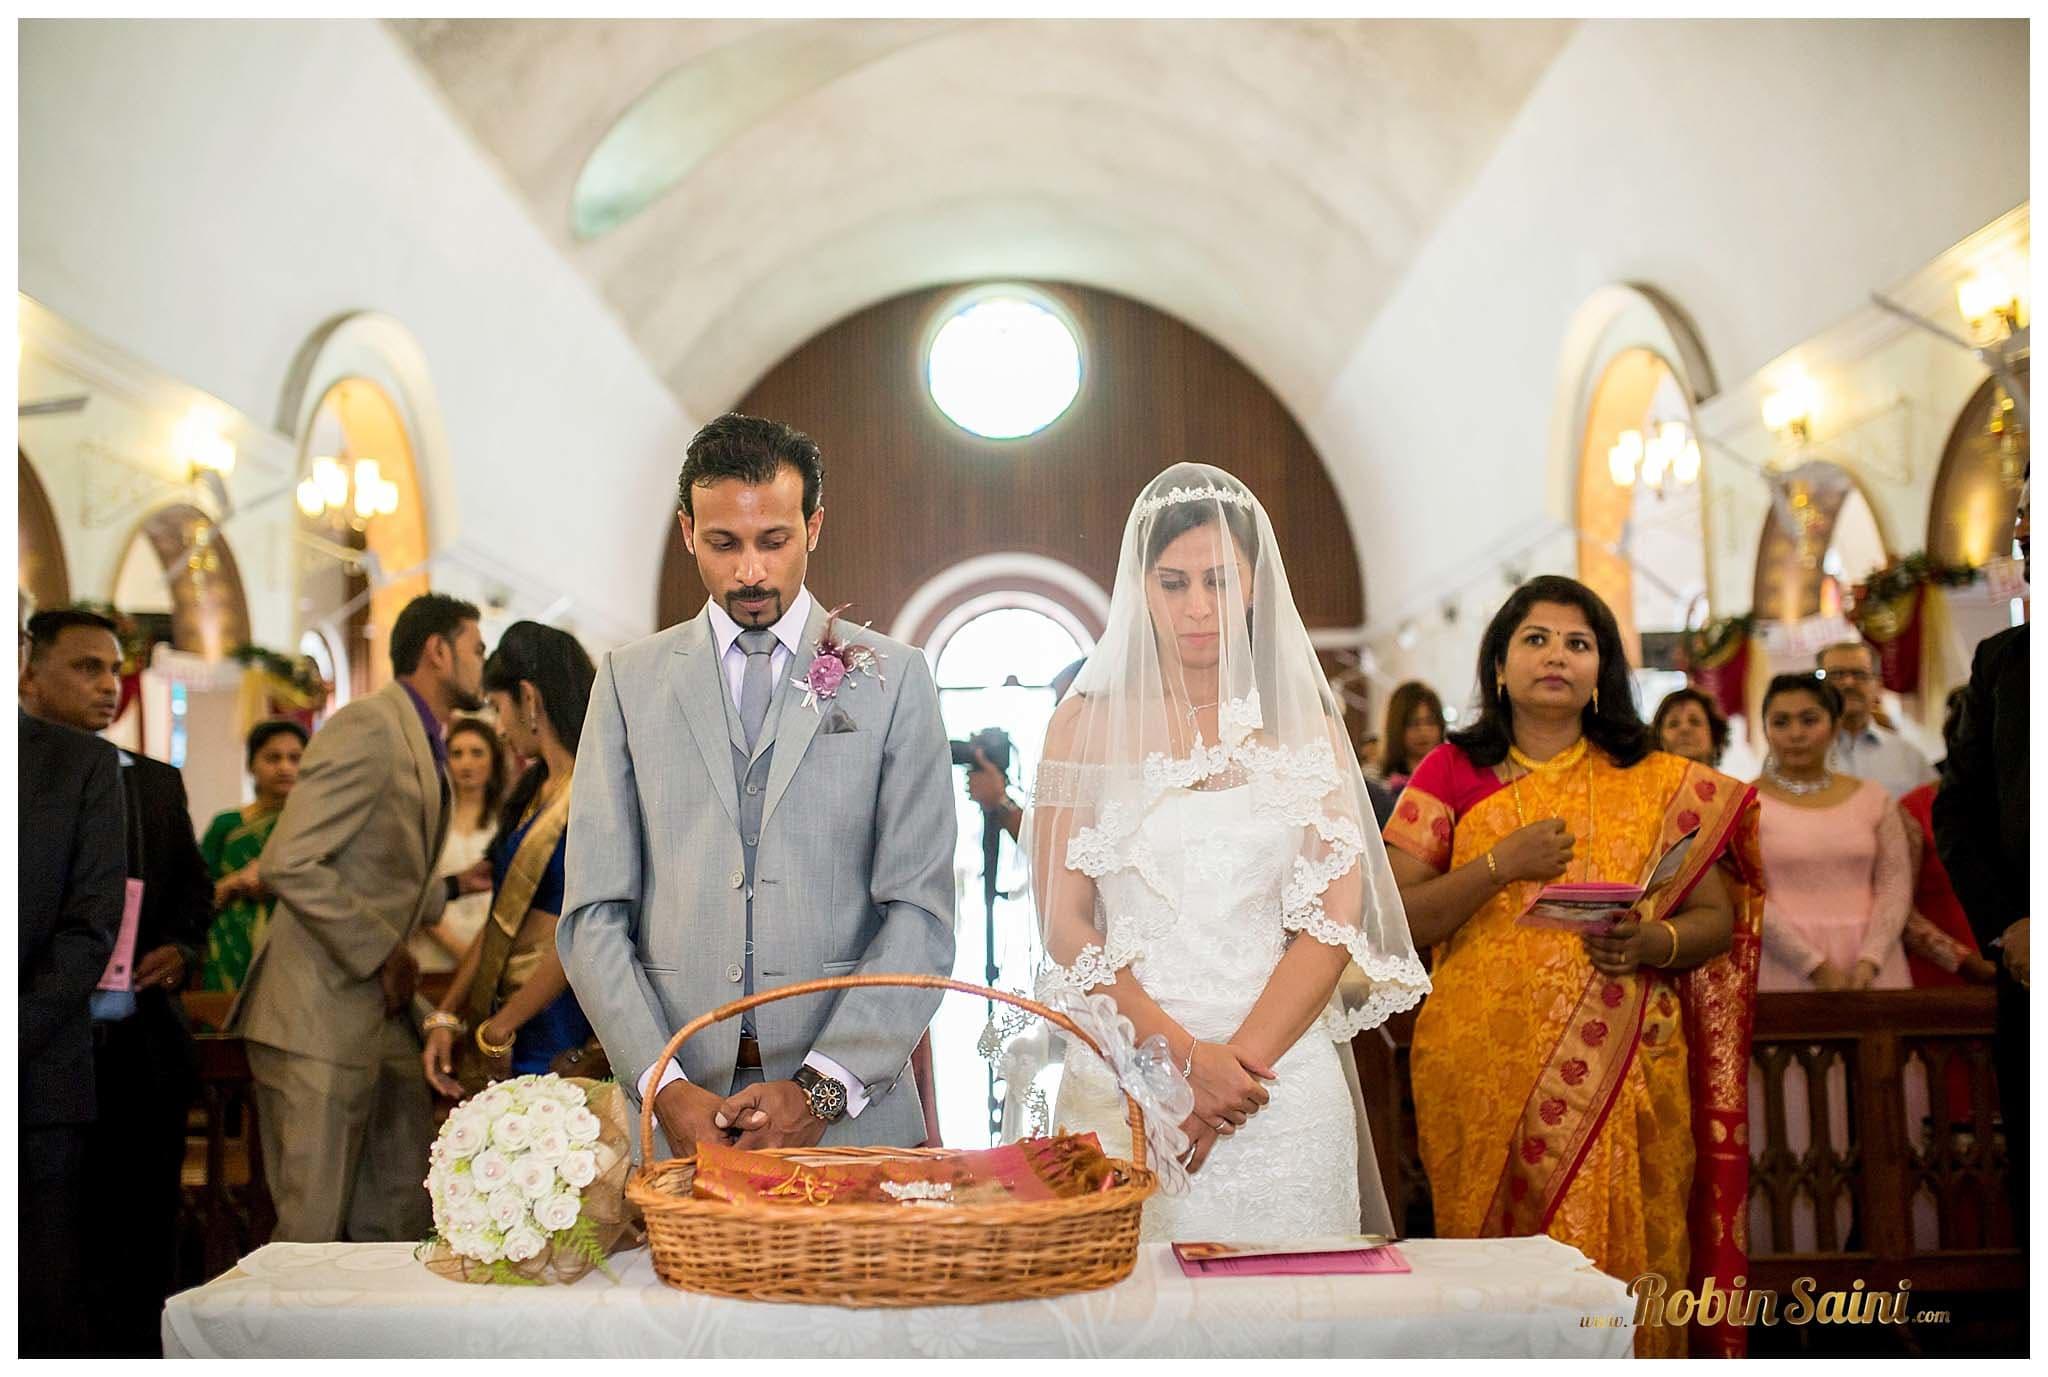 wedding rituals with bride and groom:robin saini photography